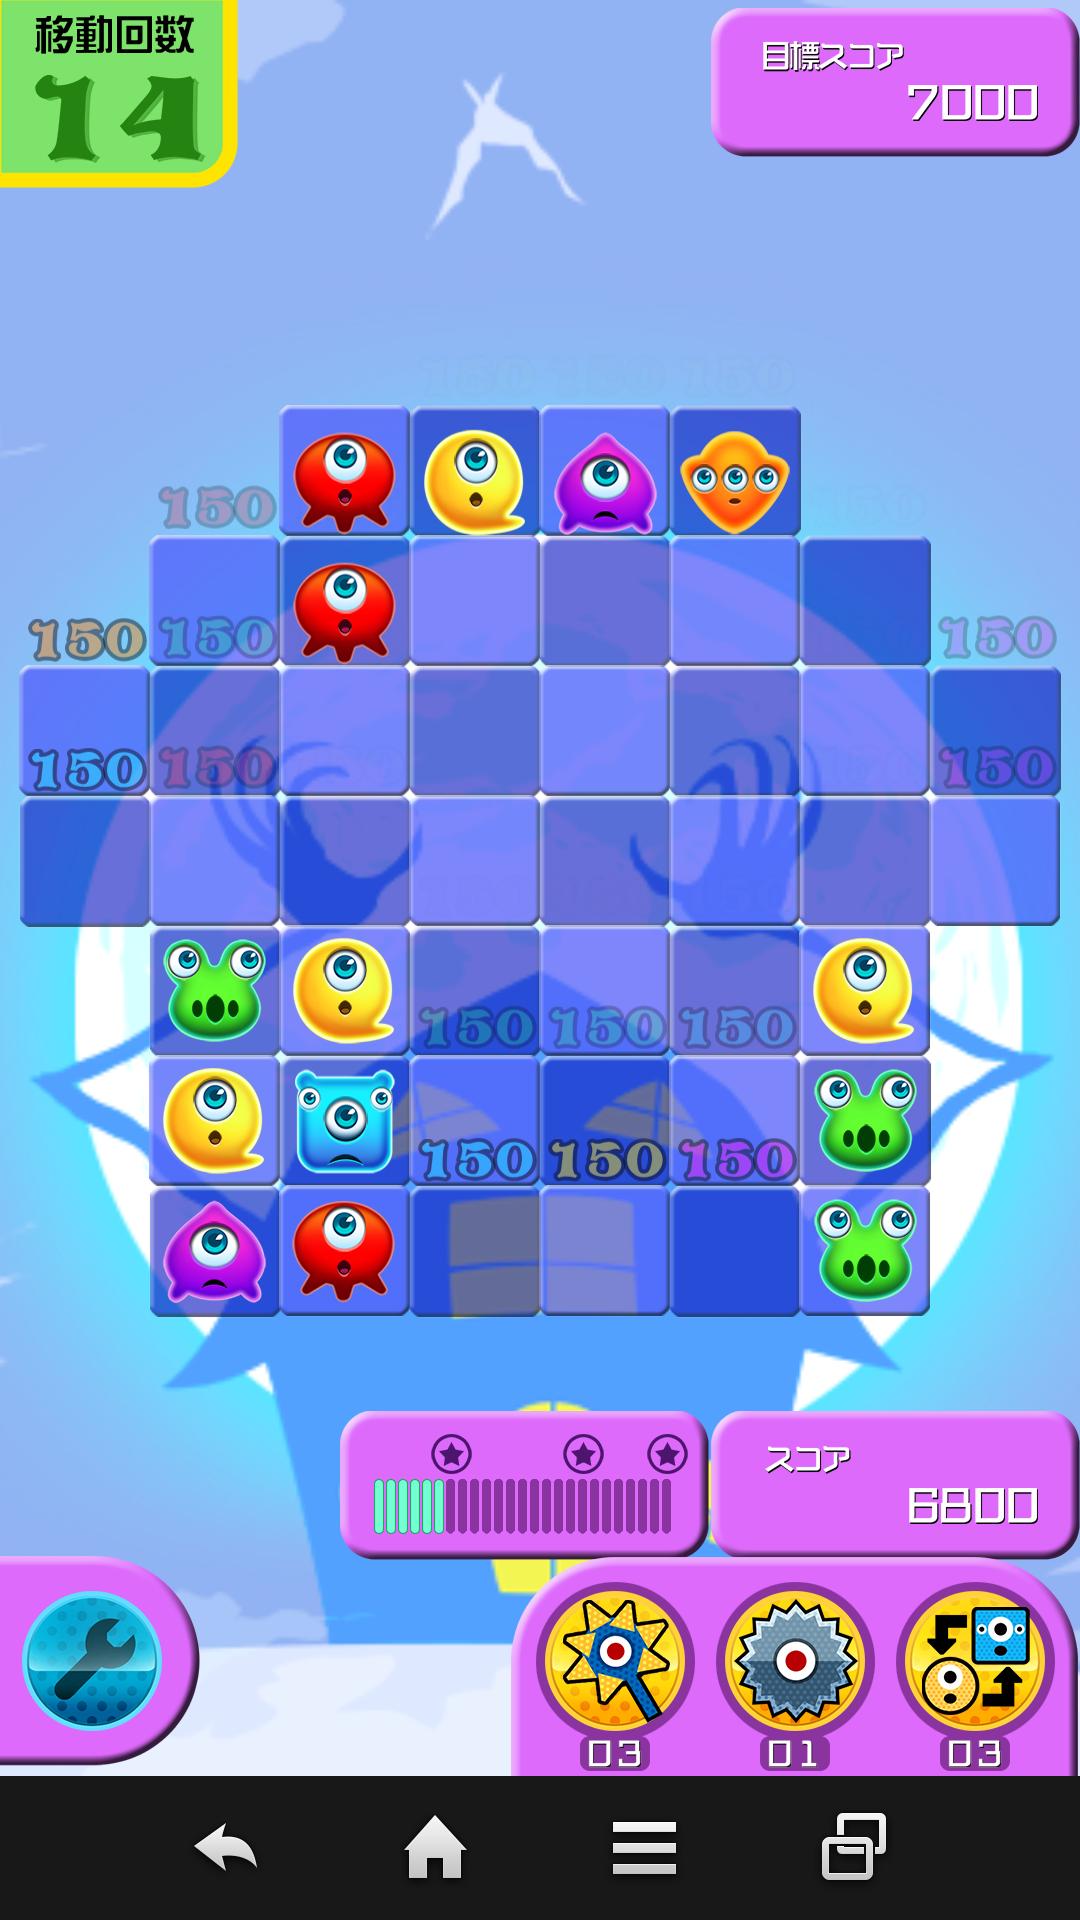 androidアプリ ぷちプチゴースト攻略スクリーンショット5